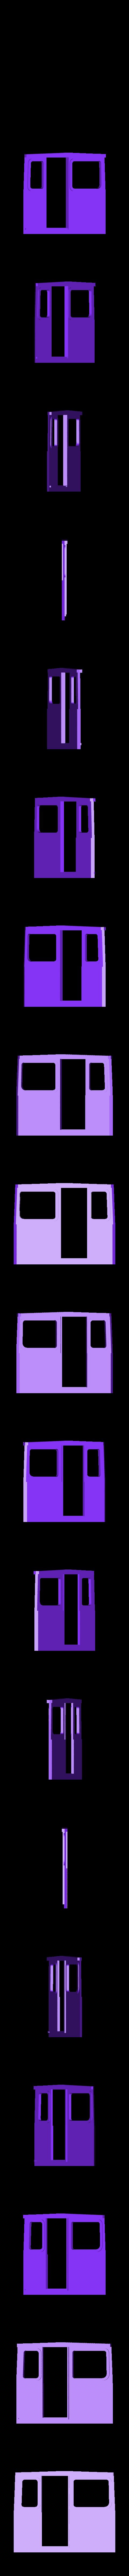 G Ar cabine.STL Download STL file Draisine Matisa for LGB • 3D printable object, biddle